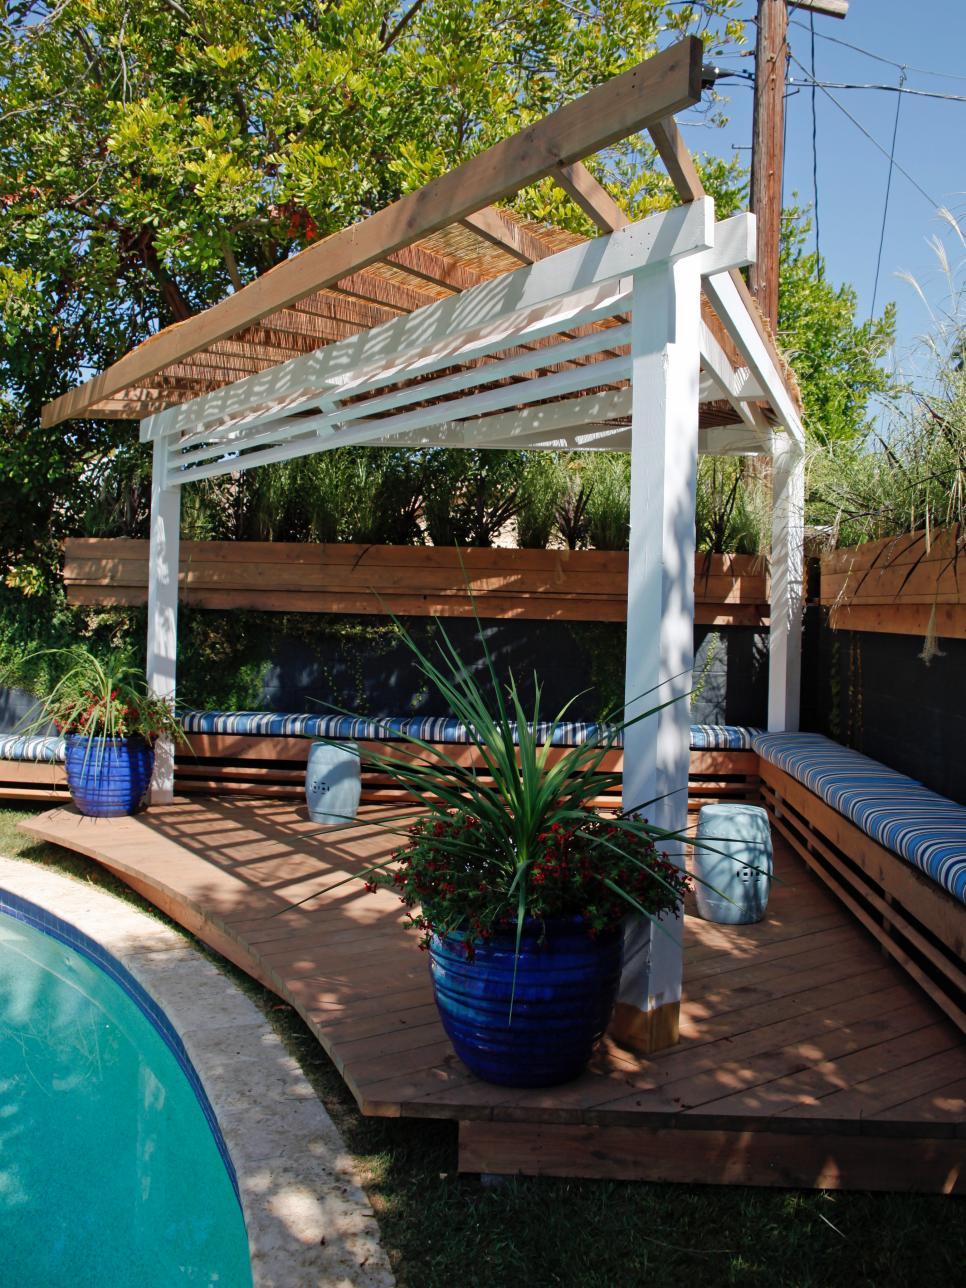 Make Shade: Canopies, Pergolas, Gazebos and More - Make Shade: Canopies, Pergolas, Gazebos And More HGTV